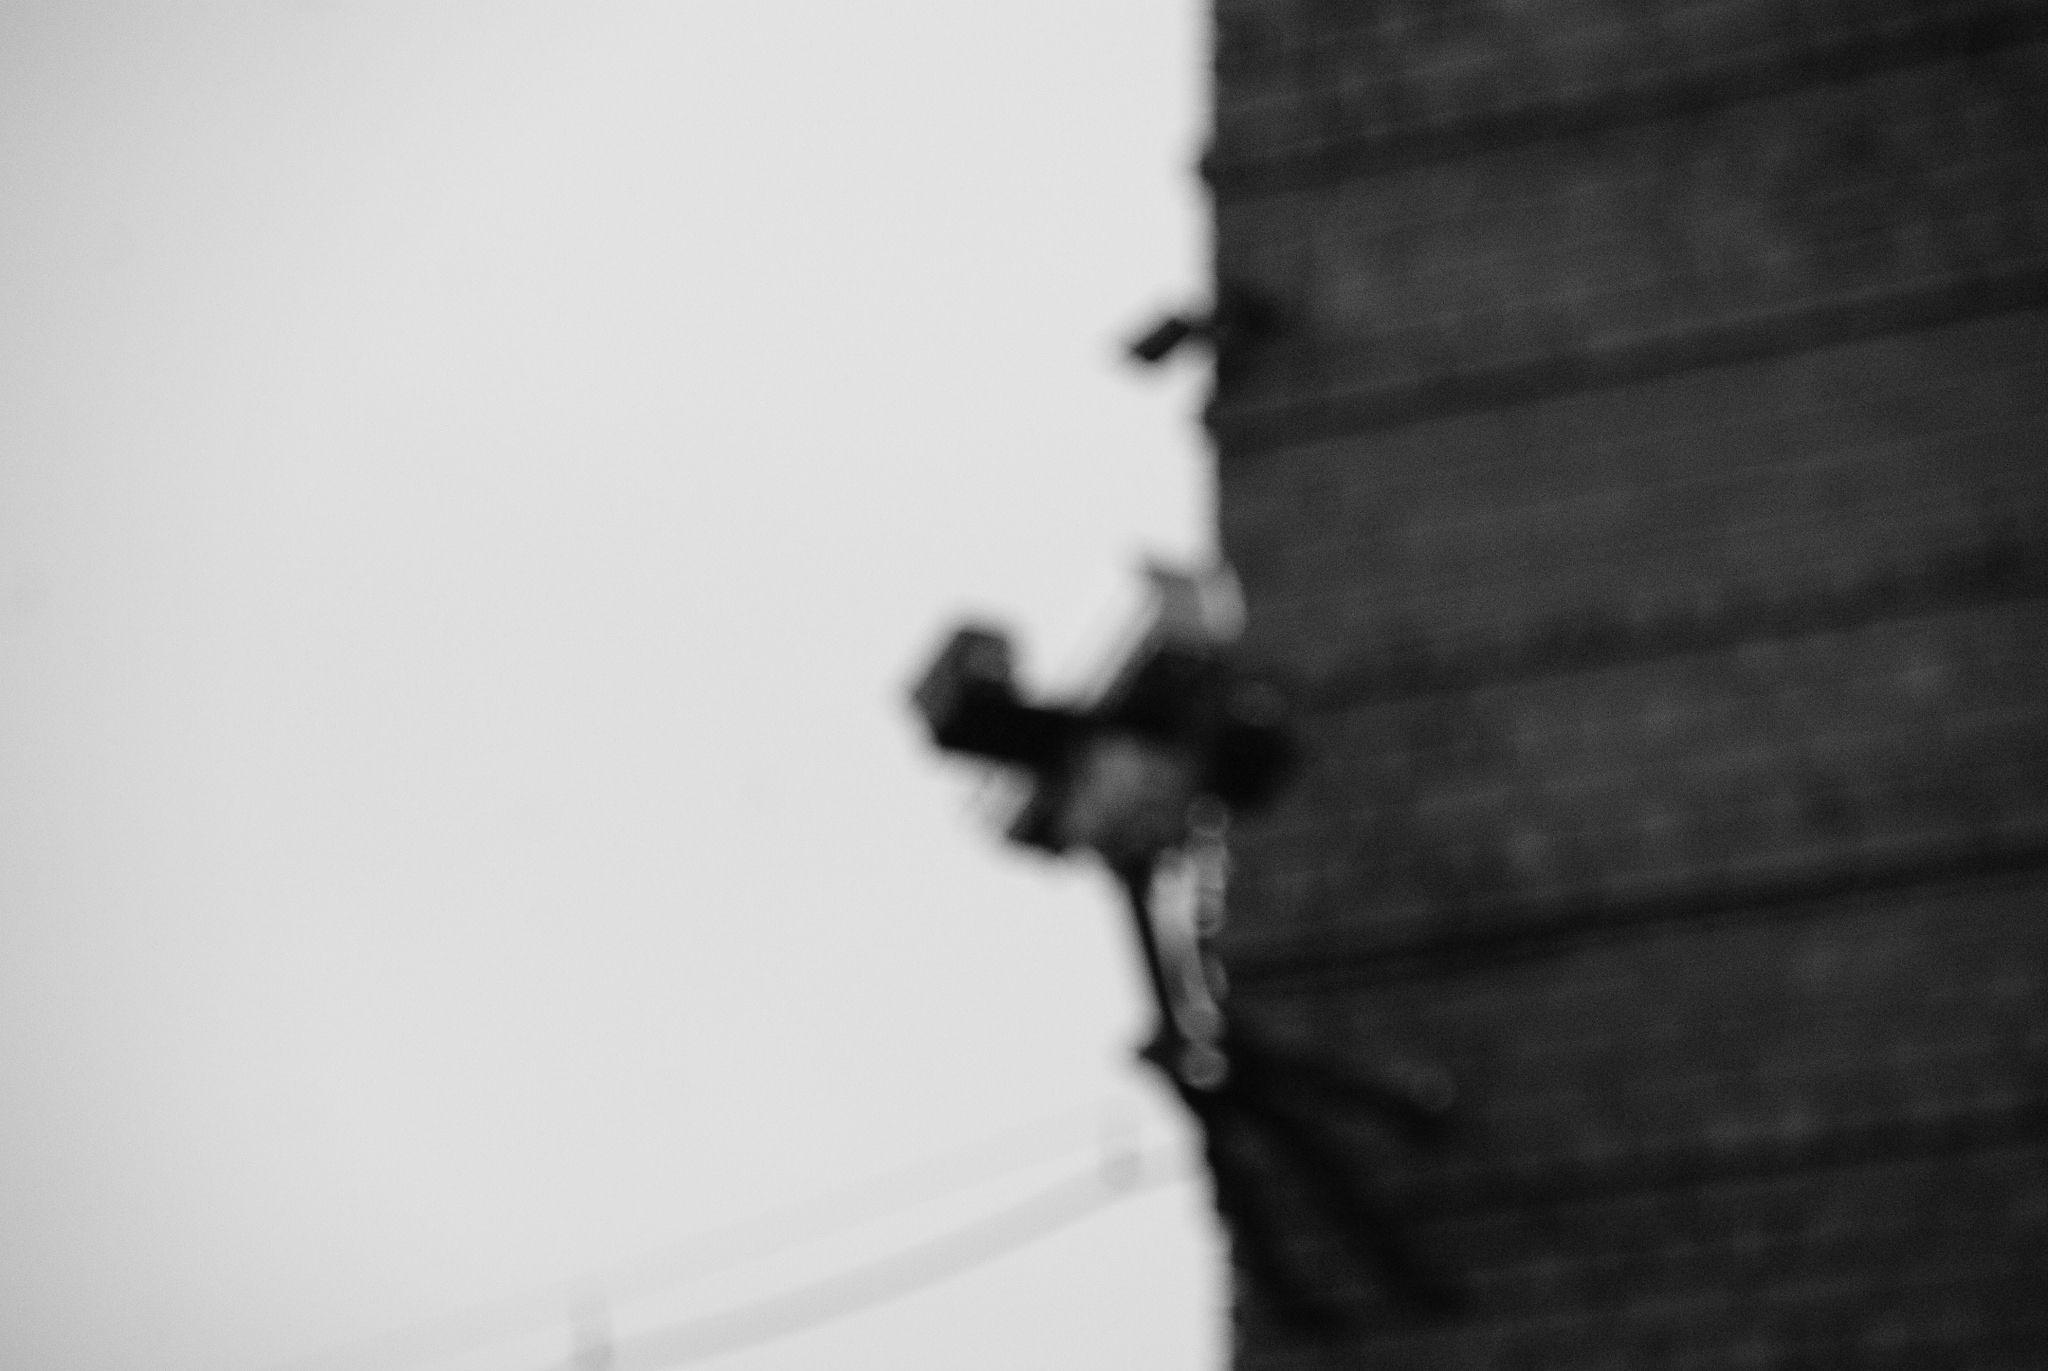 Surveillance Mono 2 by Callum Joel Richards on 500px